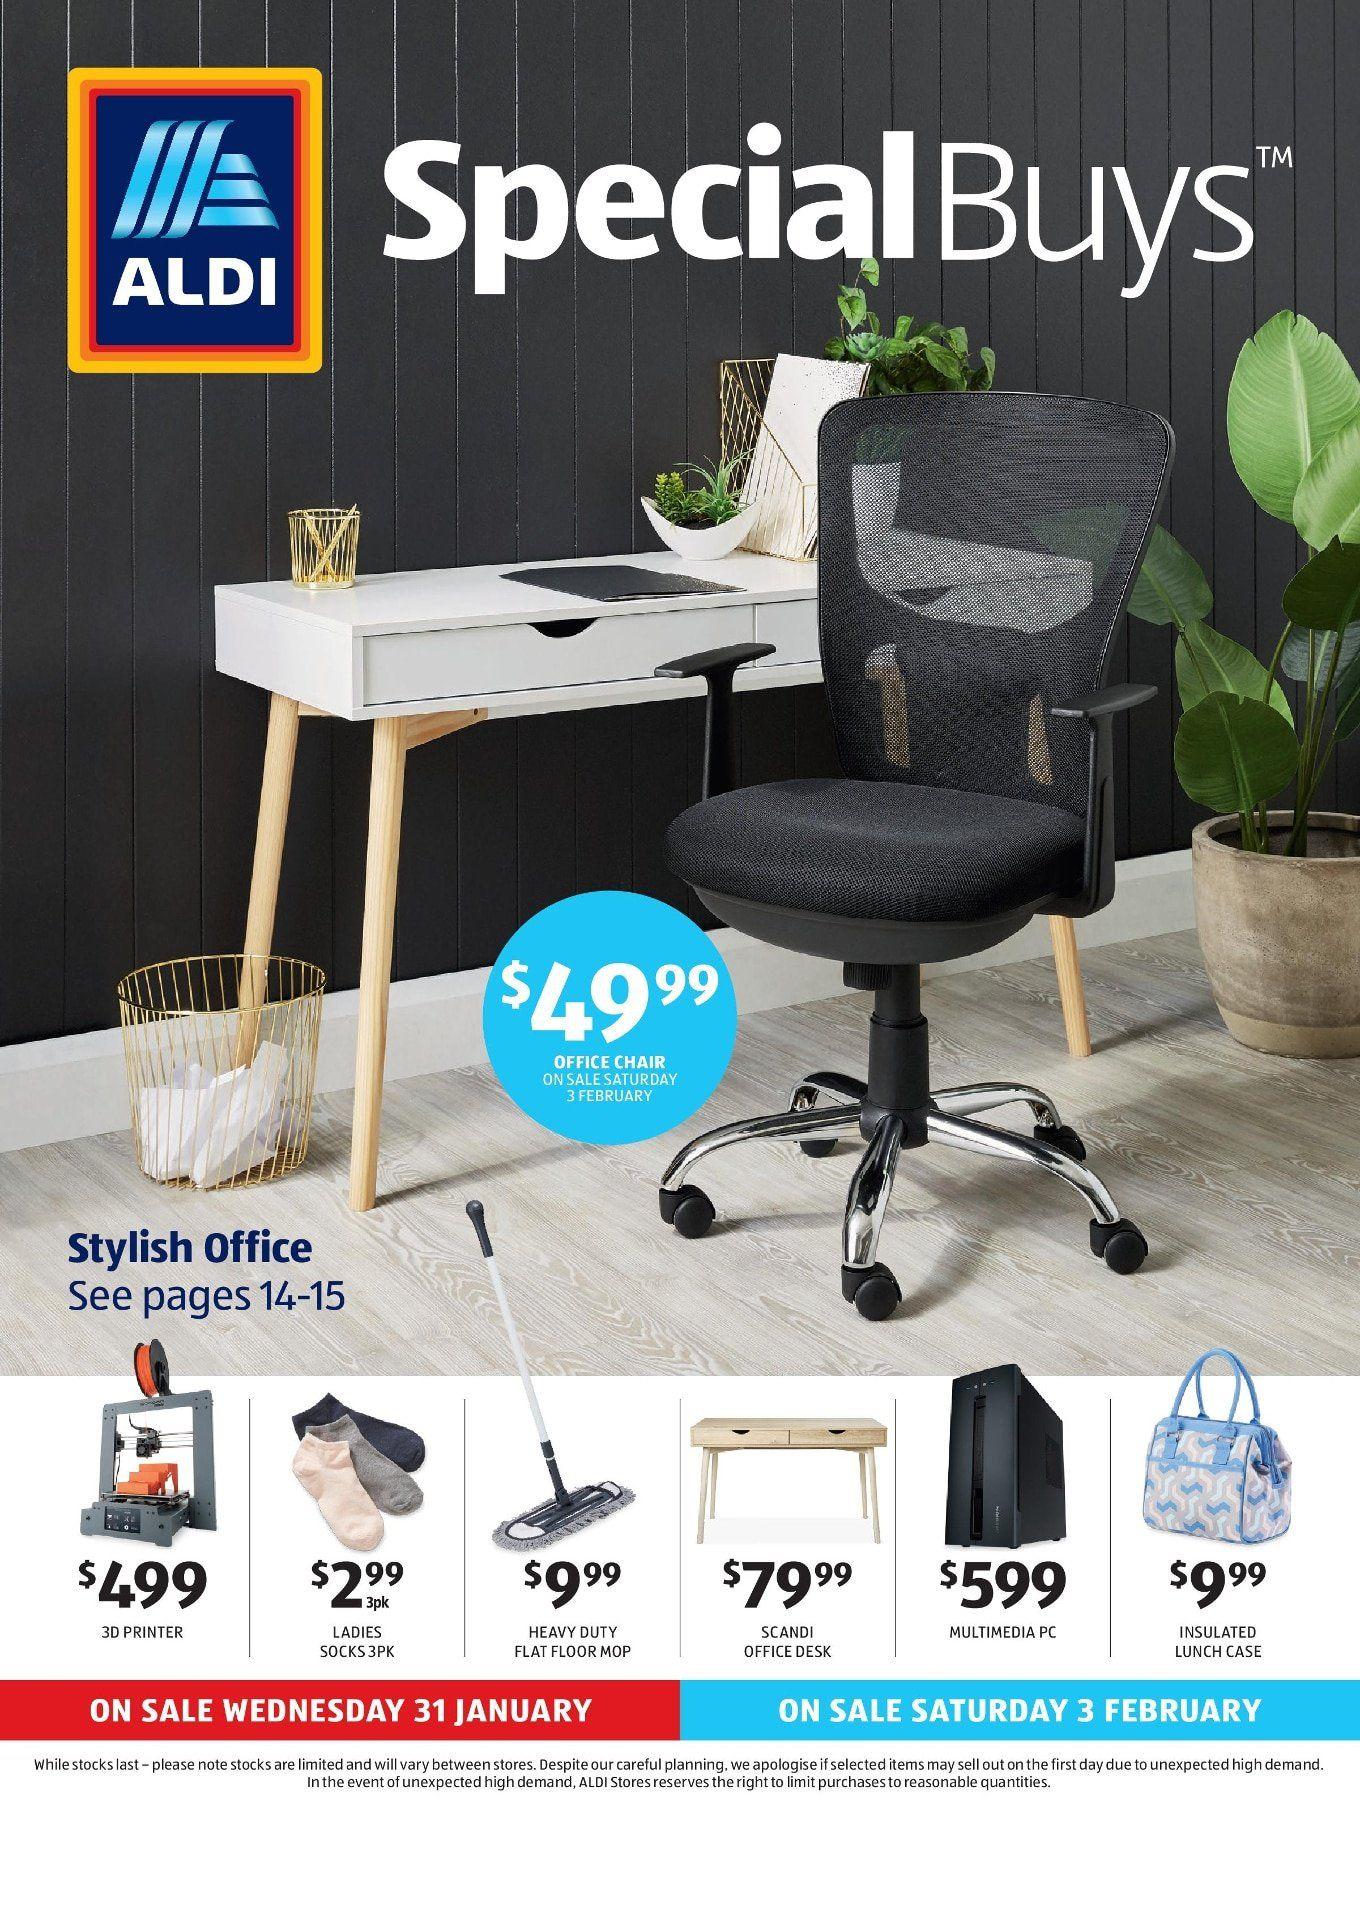 Aldi Catalogue 31 January 6 February 2018 Aldi Aldi Specials Dm Design